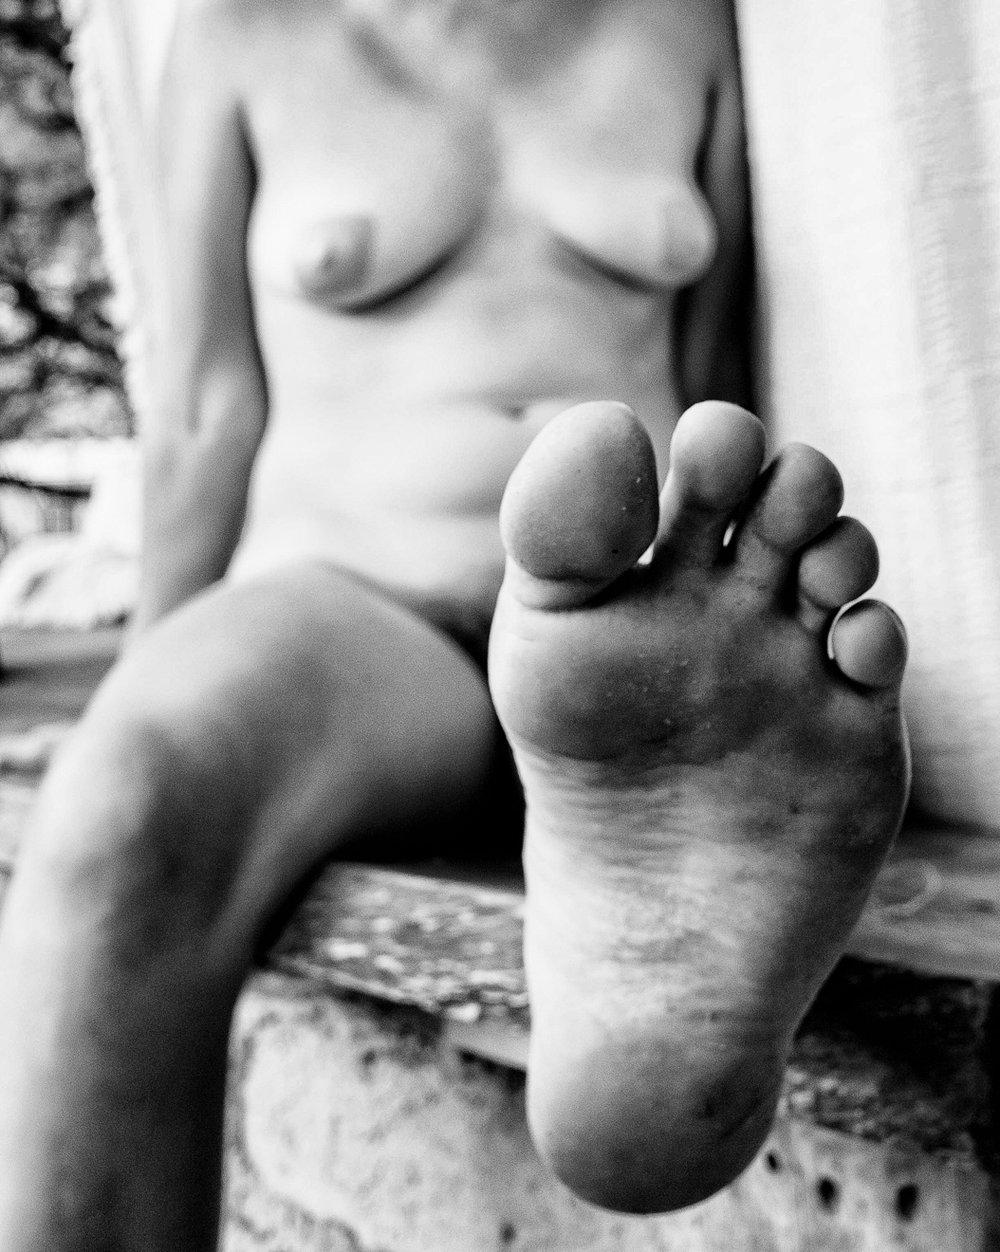 Audrey_B+W Body-2.jpg